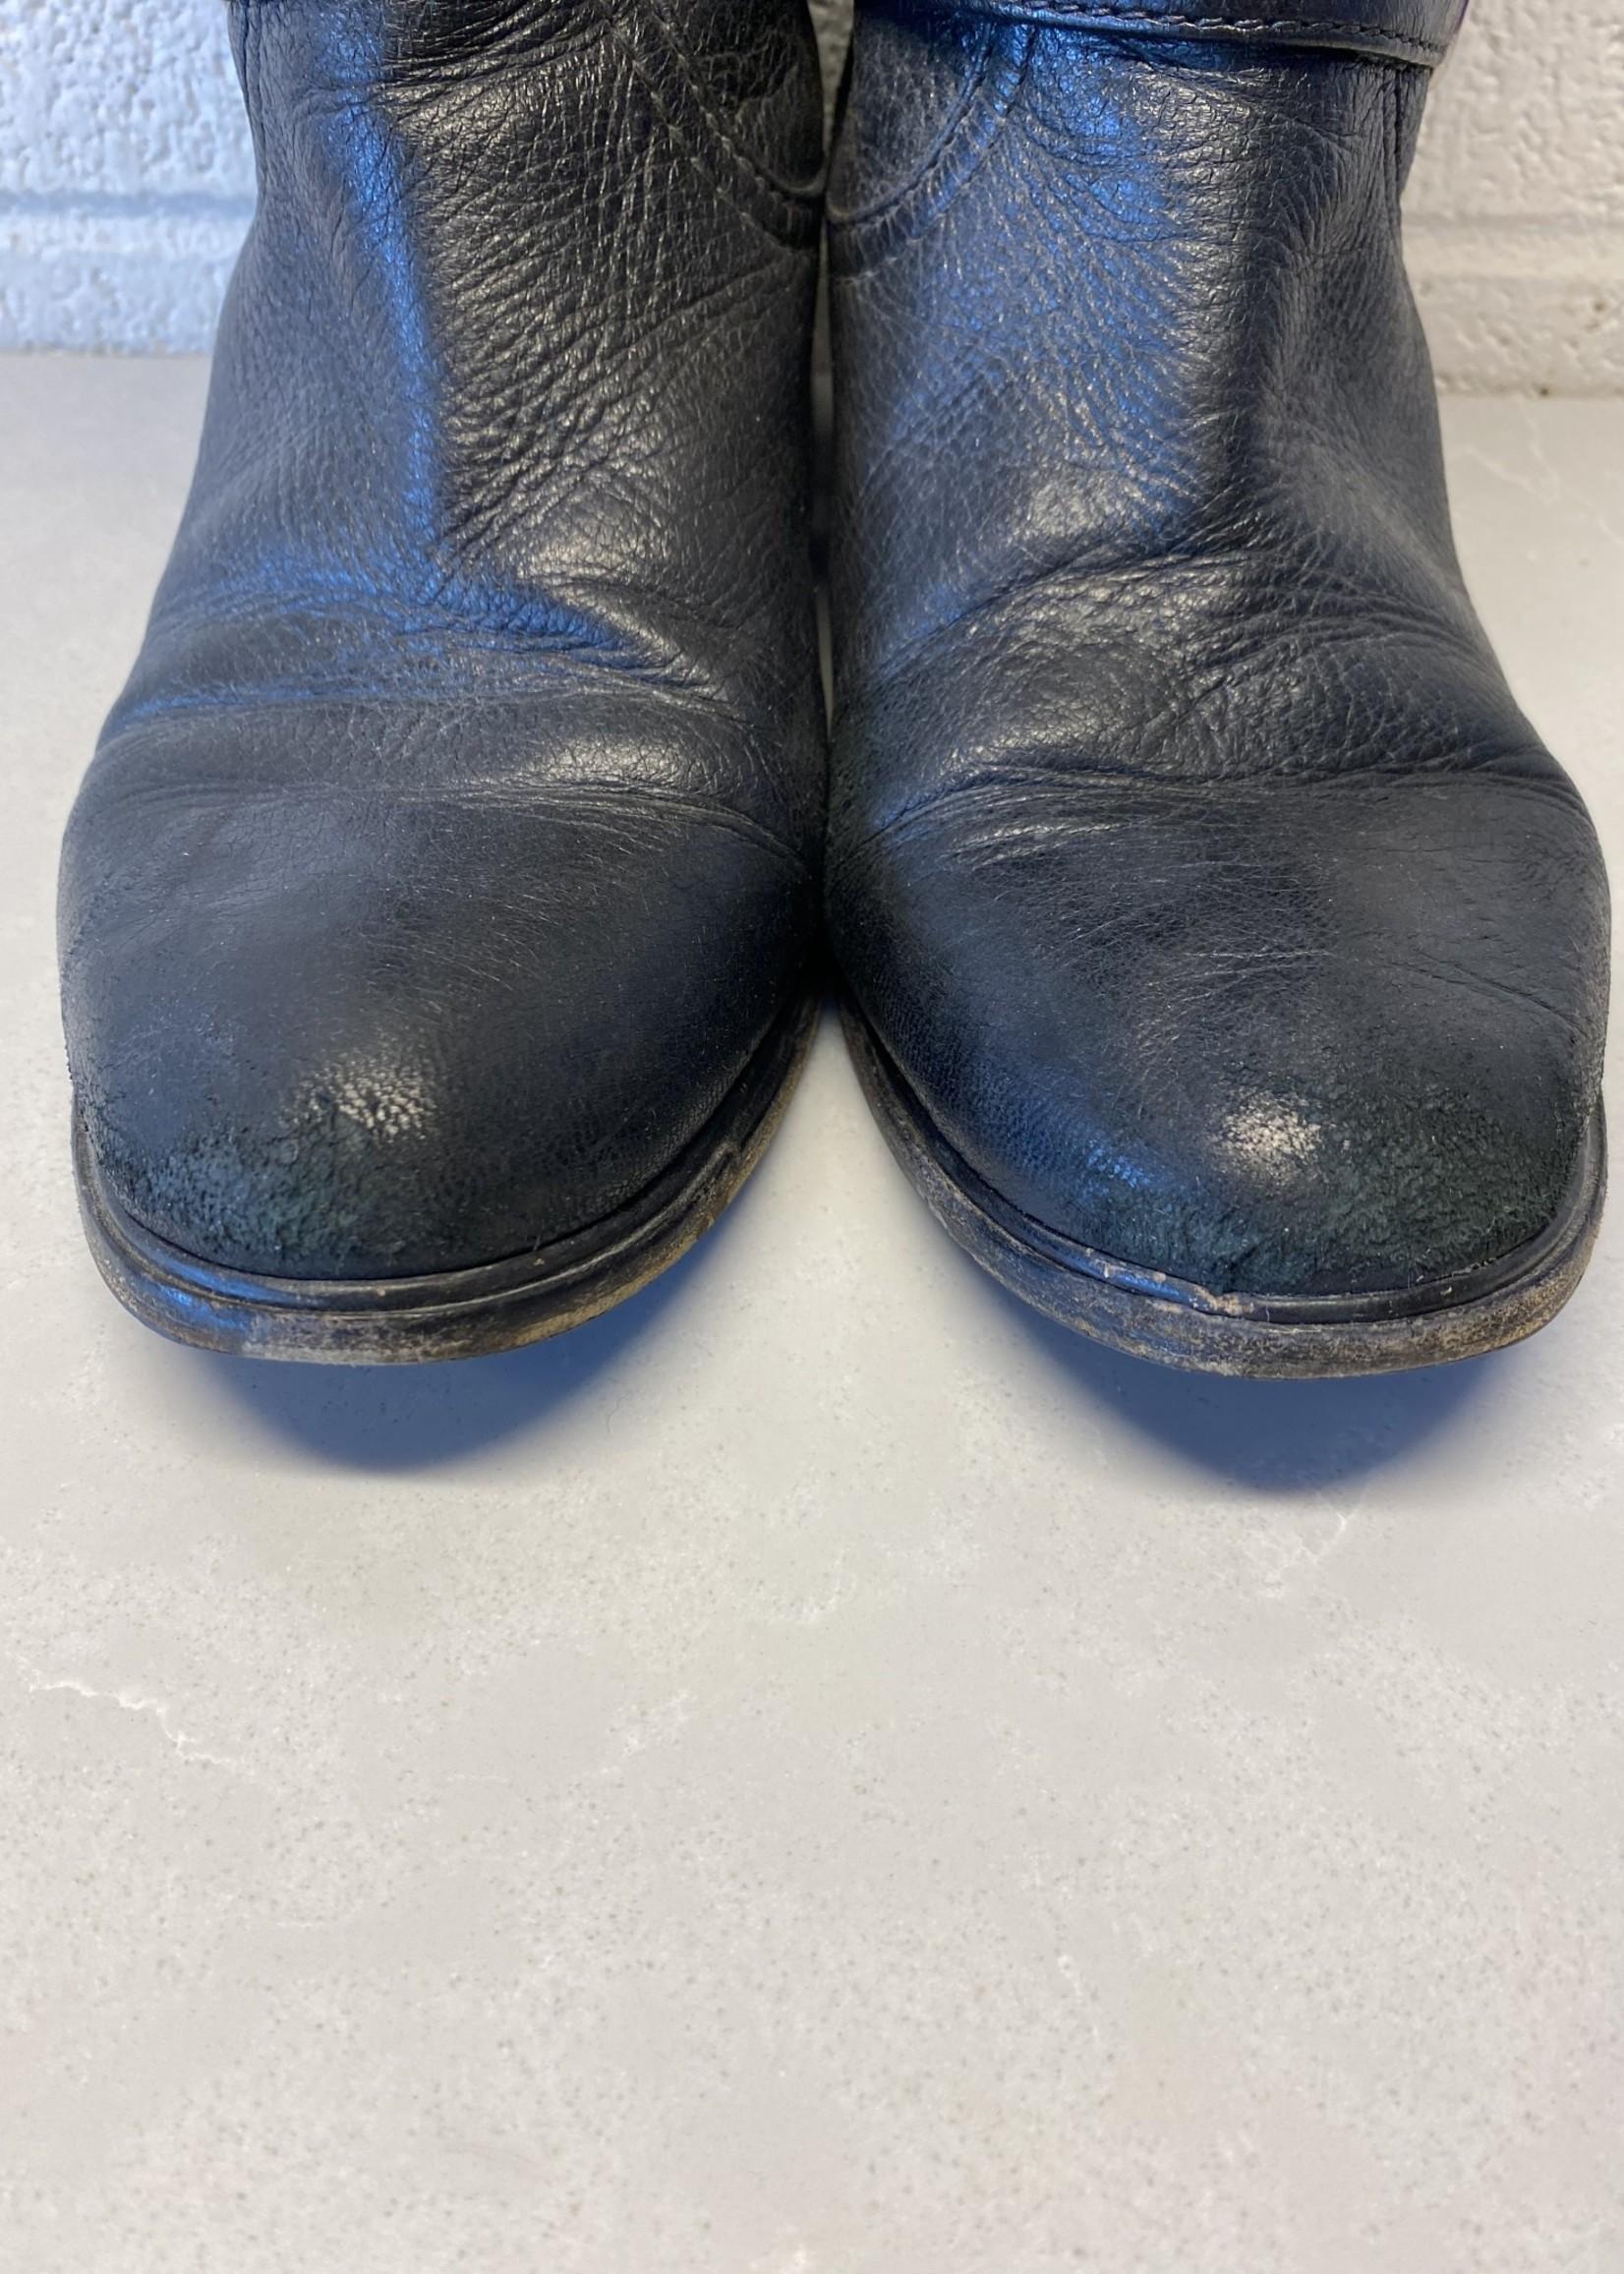 Prada Cervo Leather Buckle Boots